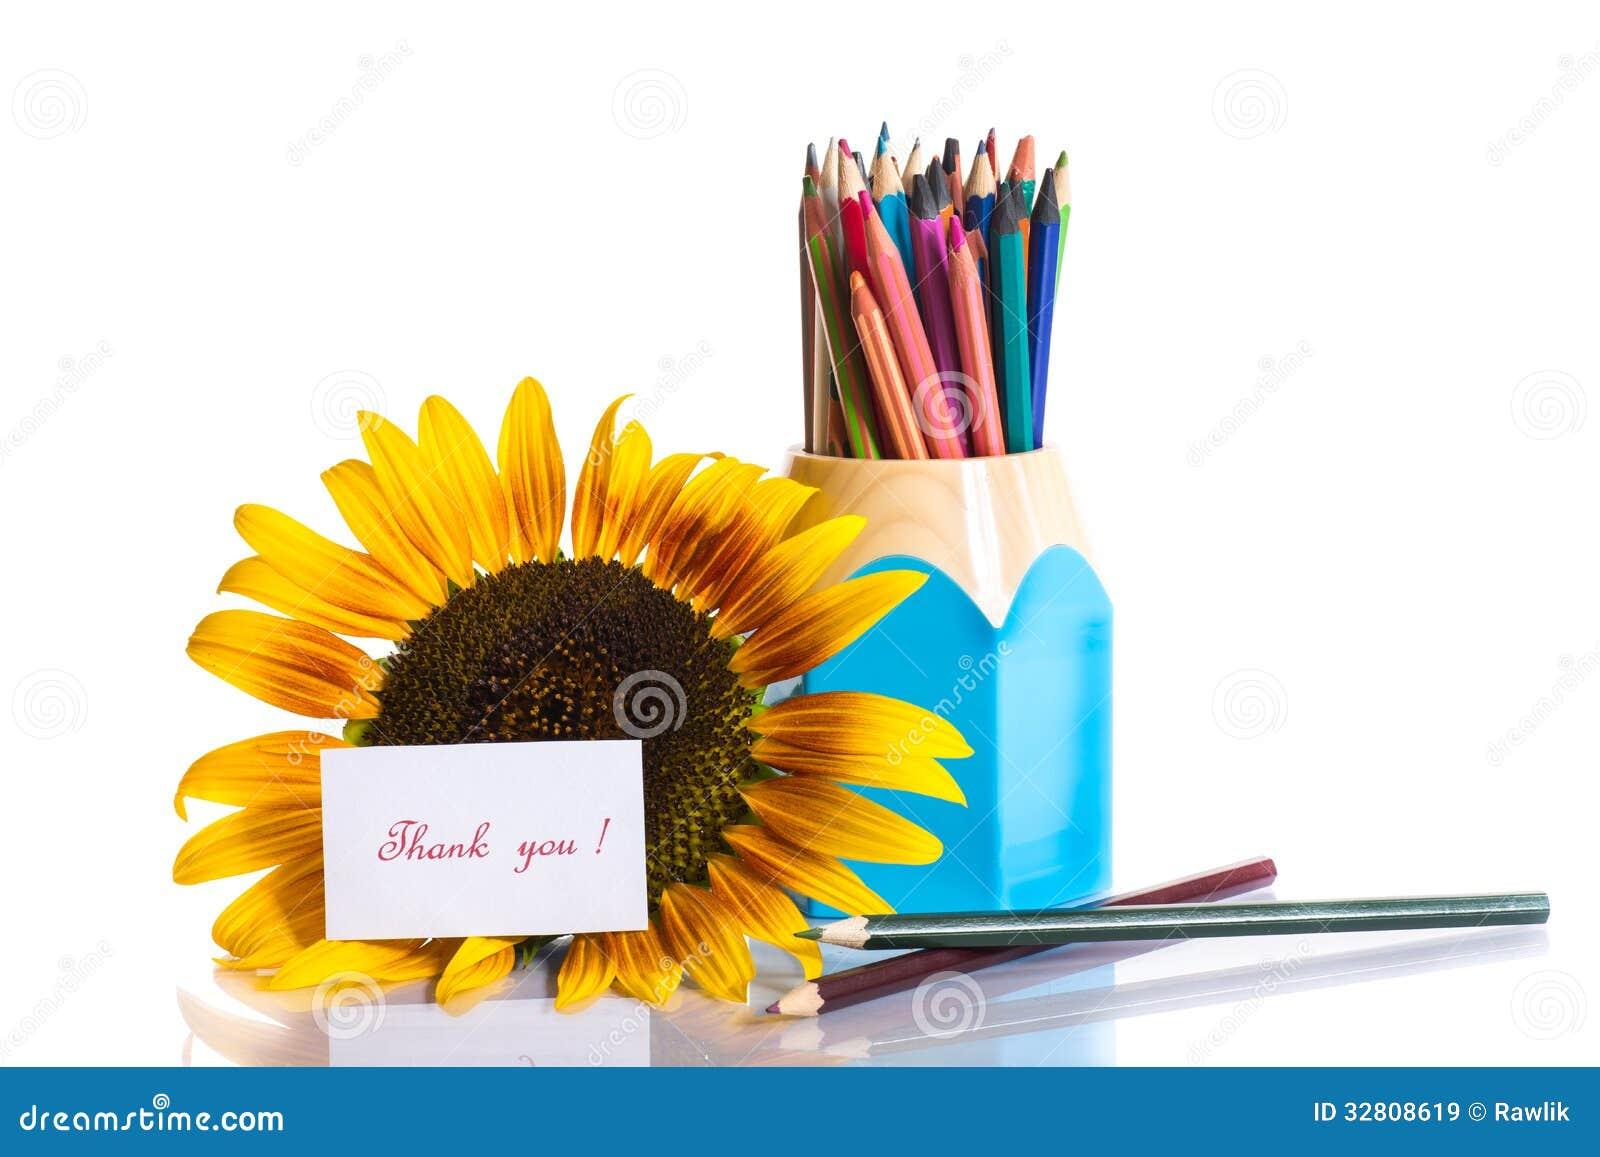 teachers day stock image image of happy blue elegance